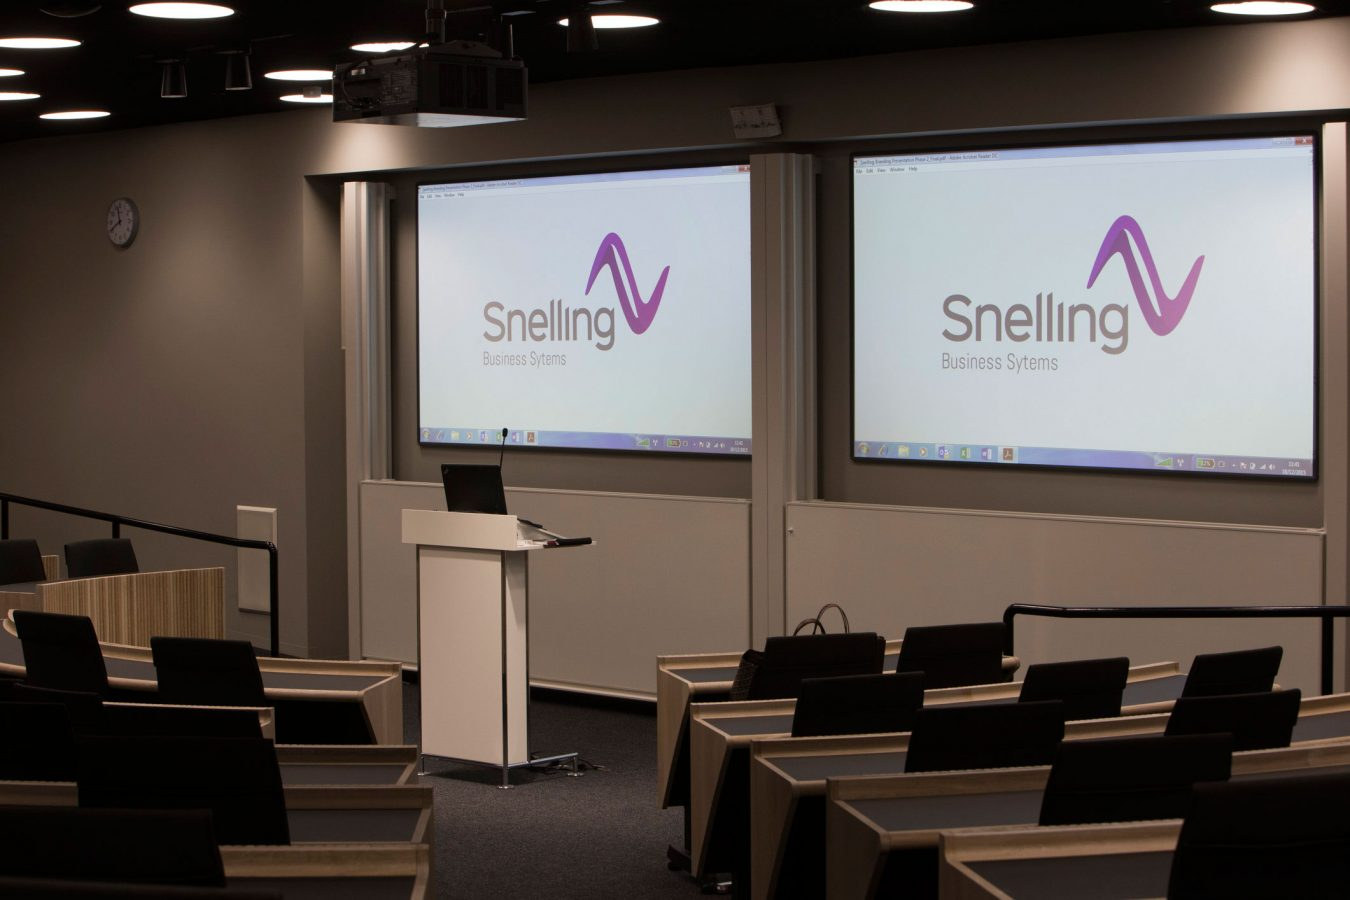 Blavatnik | Snelling Business Systems 22